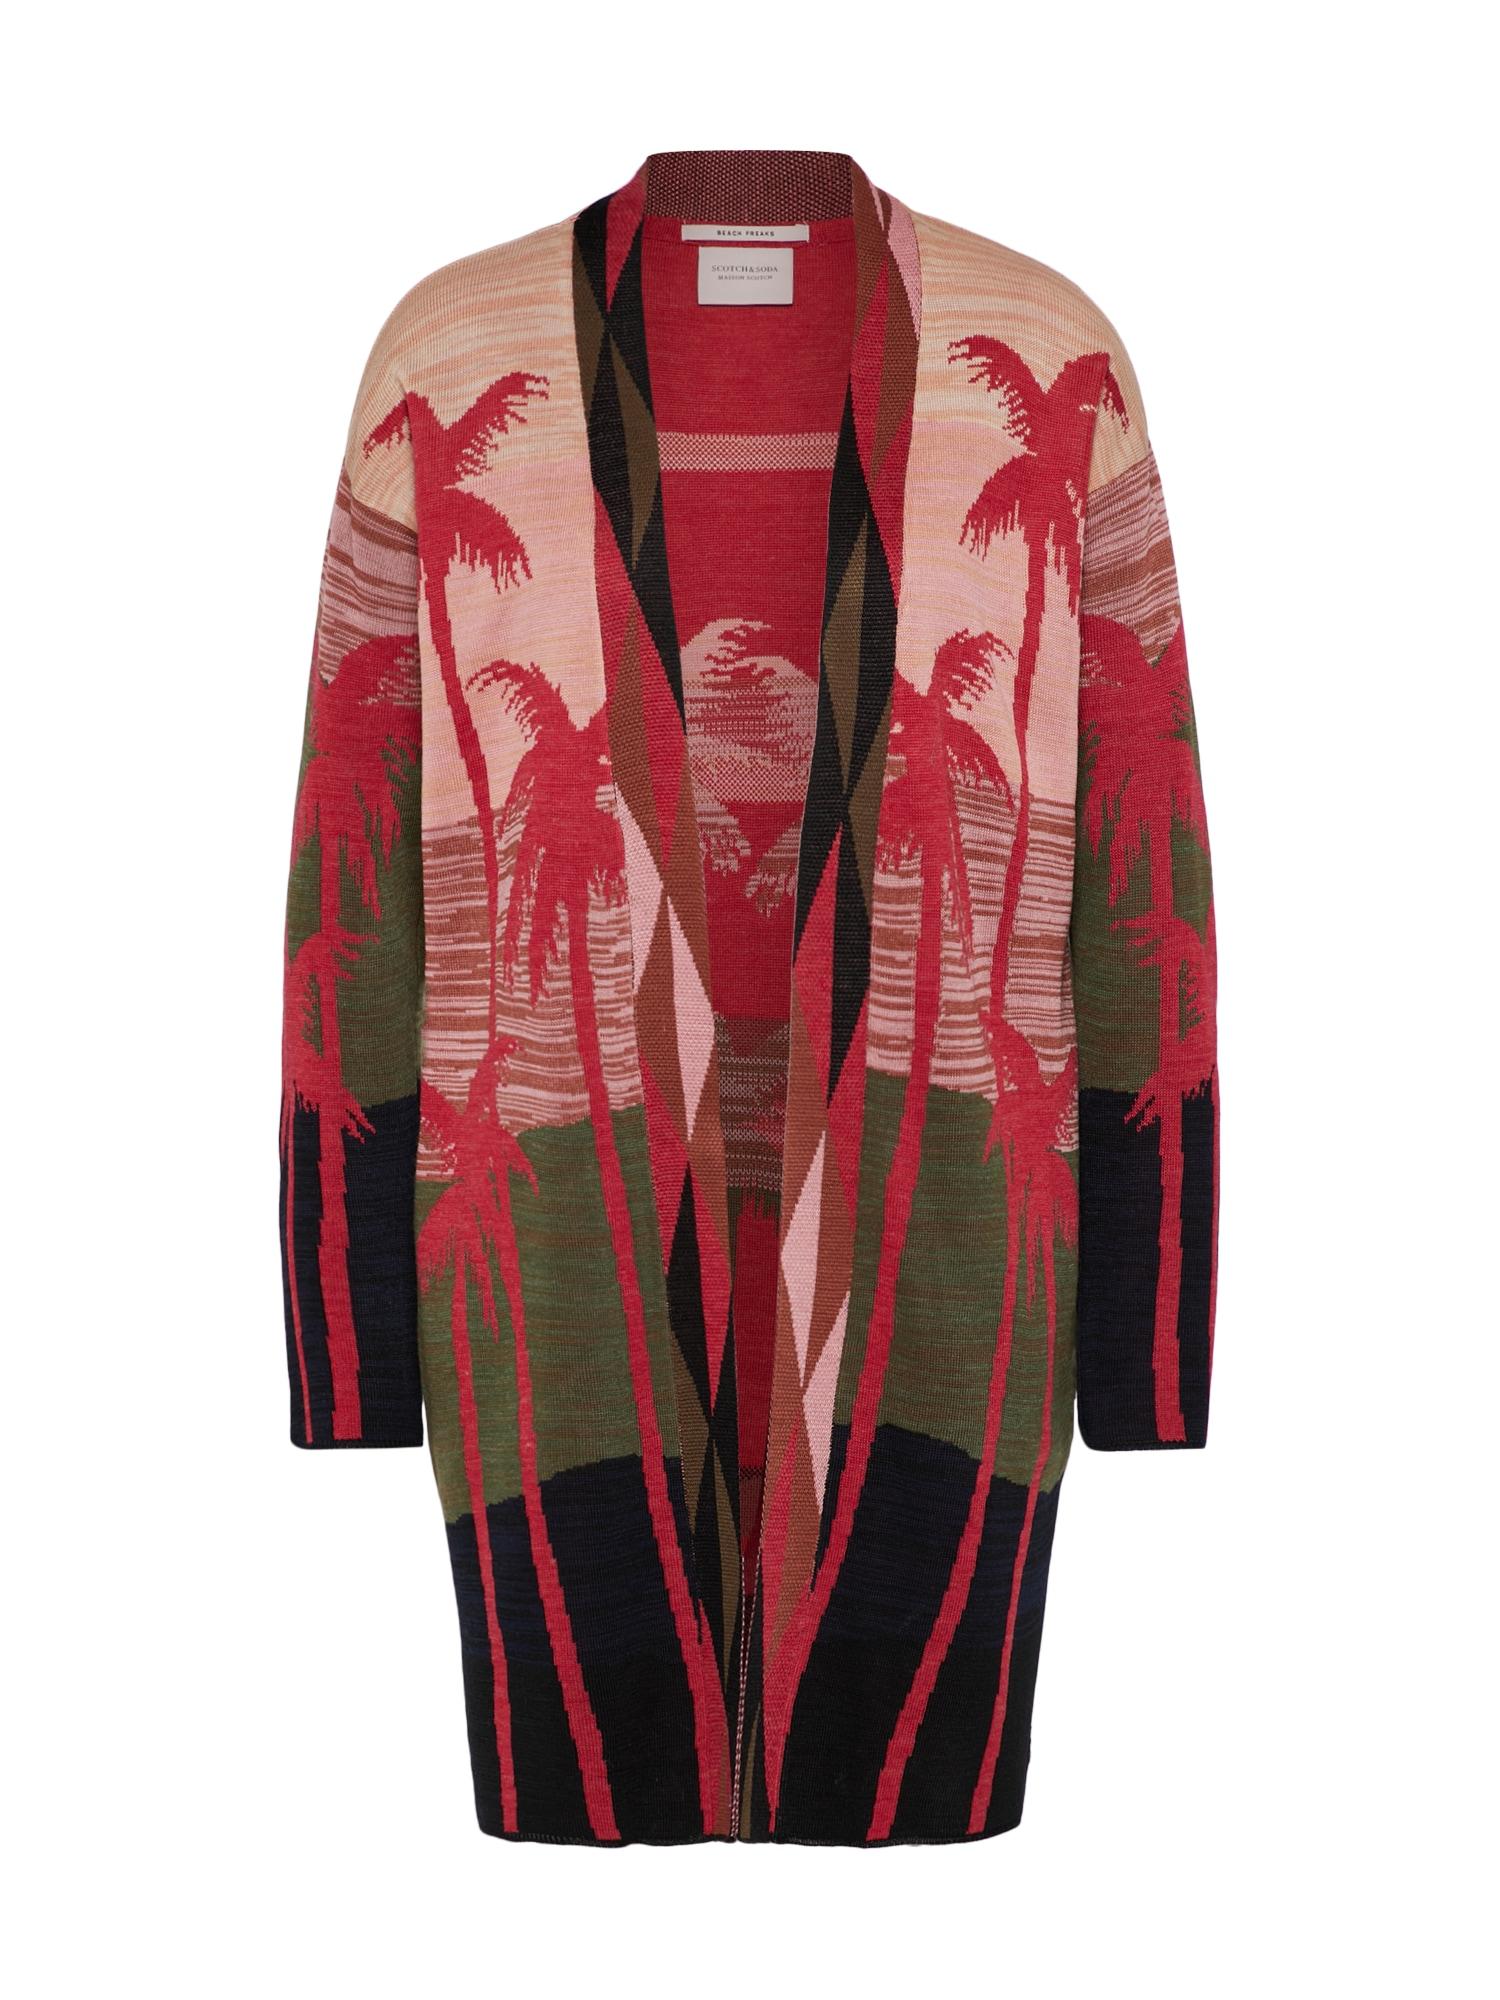 SCOTCH  and  SODA Dames Gebreid vest Longer length cardigan kaki rood zwart